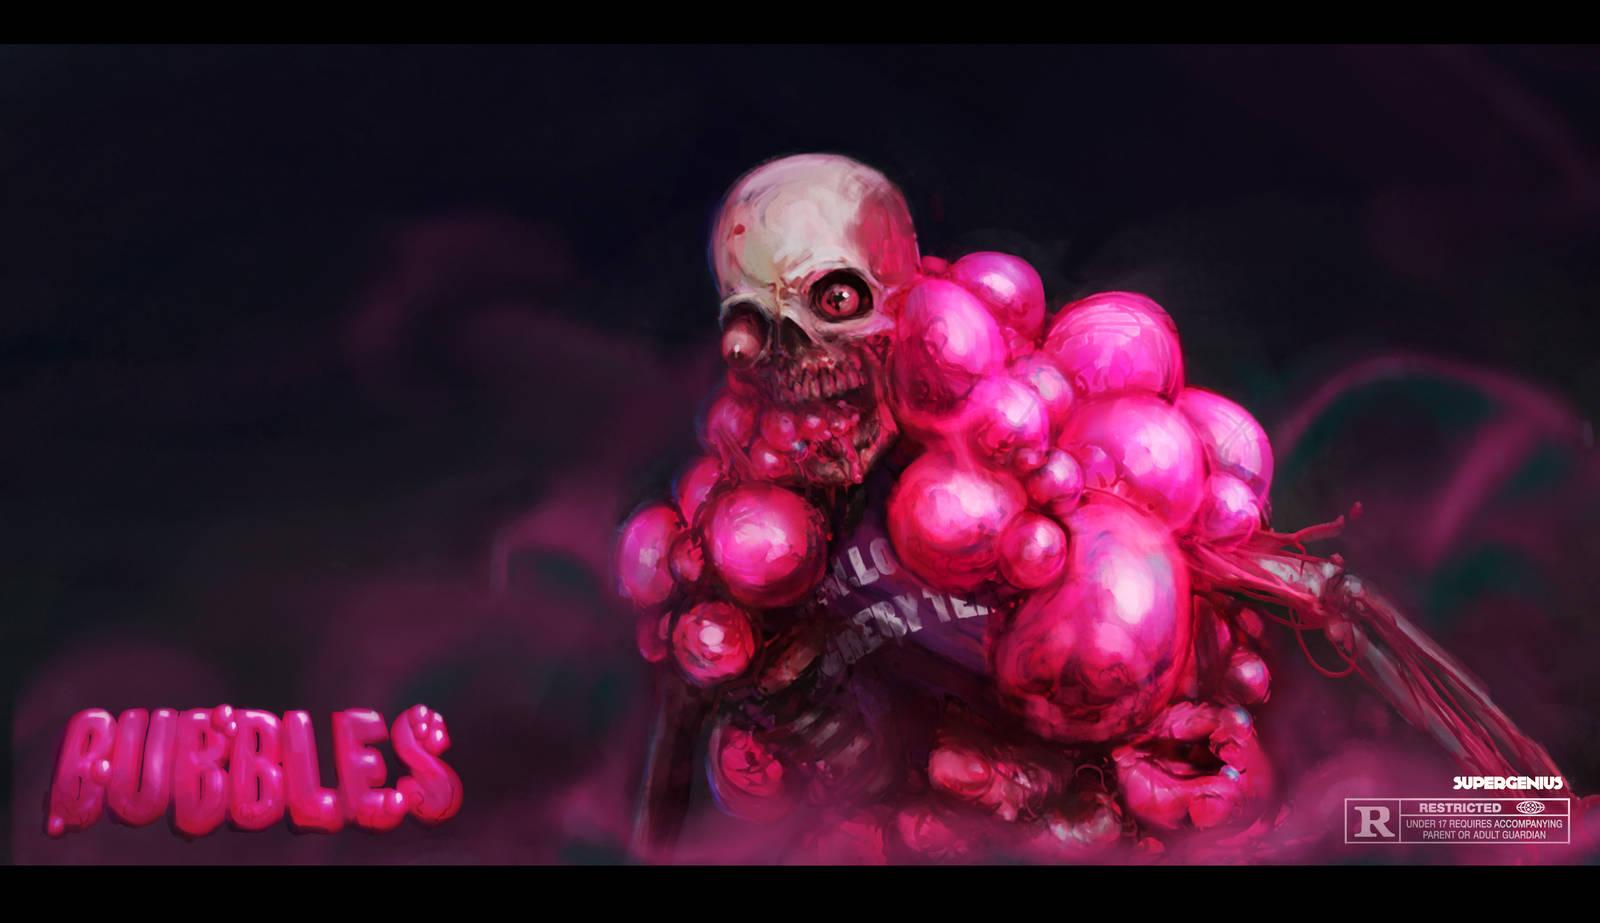 Bubbles - The Movie by KruddMan